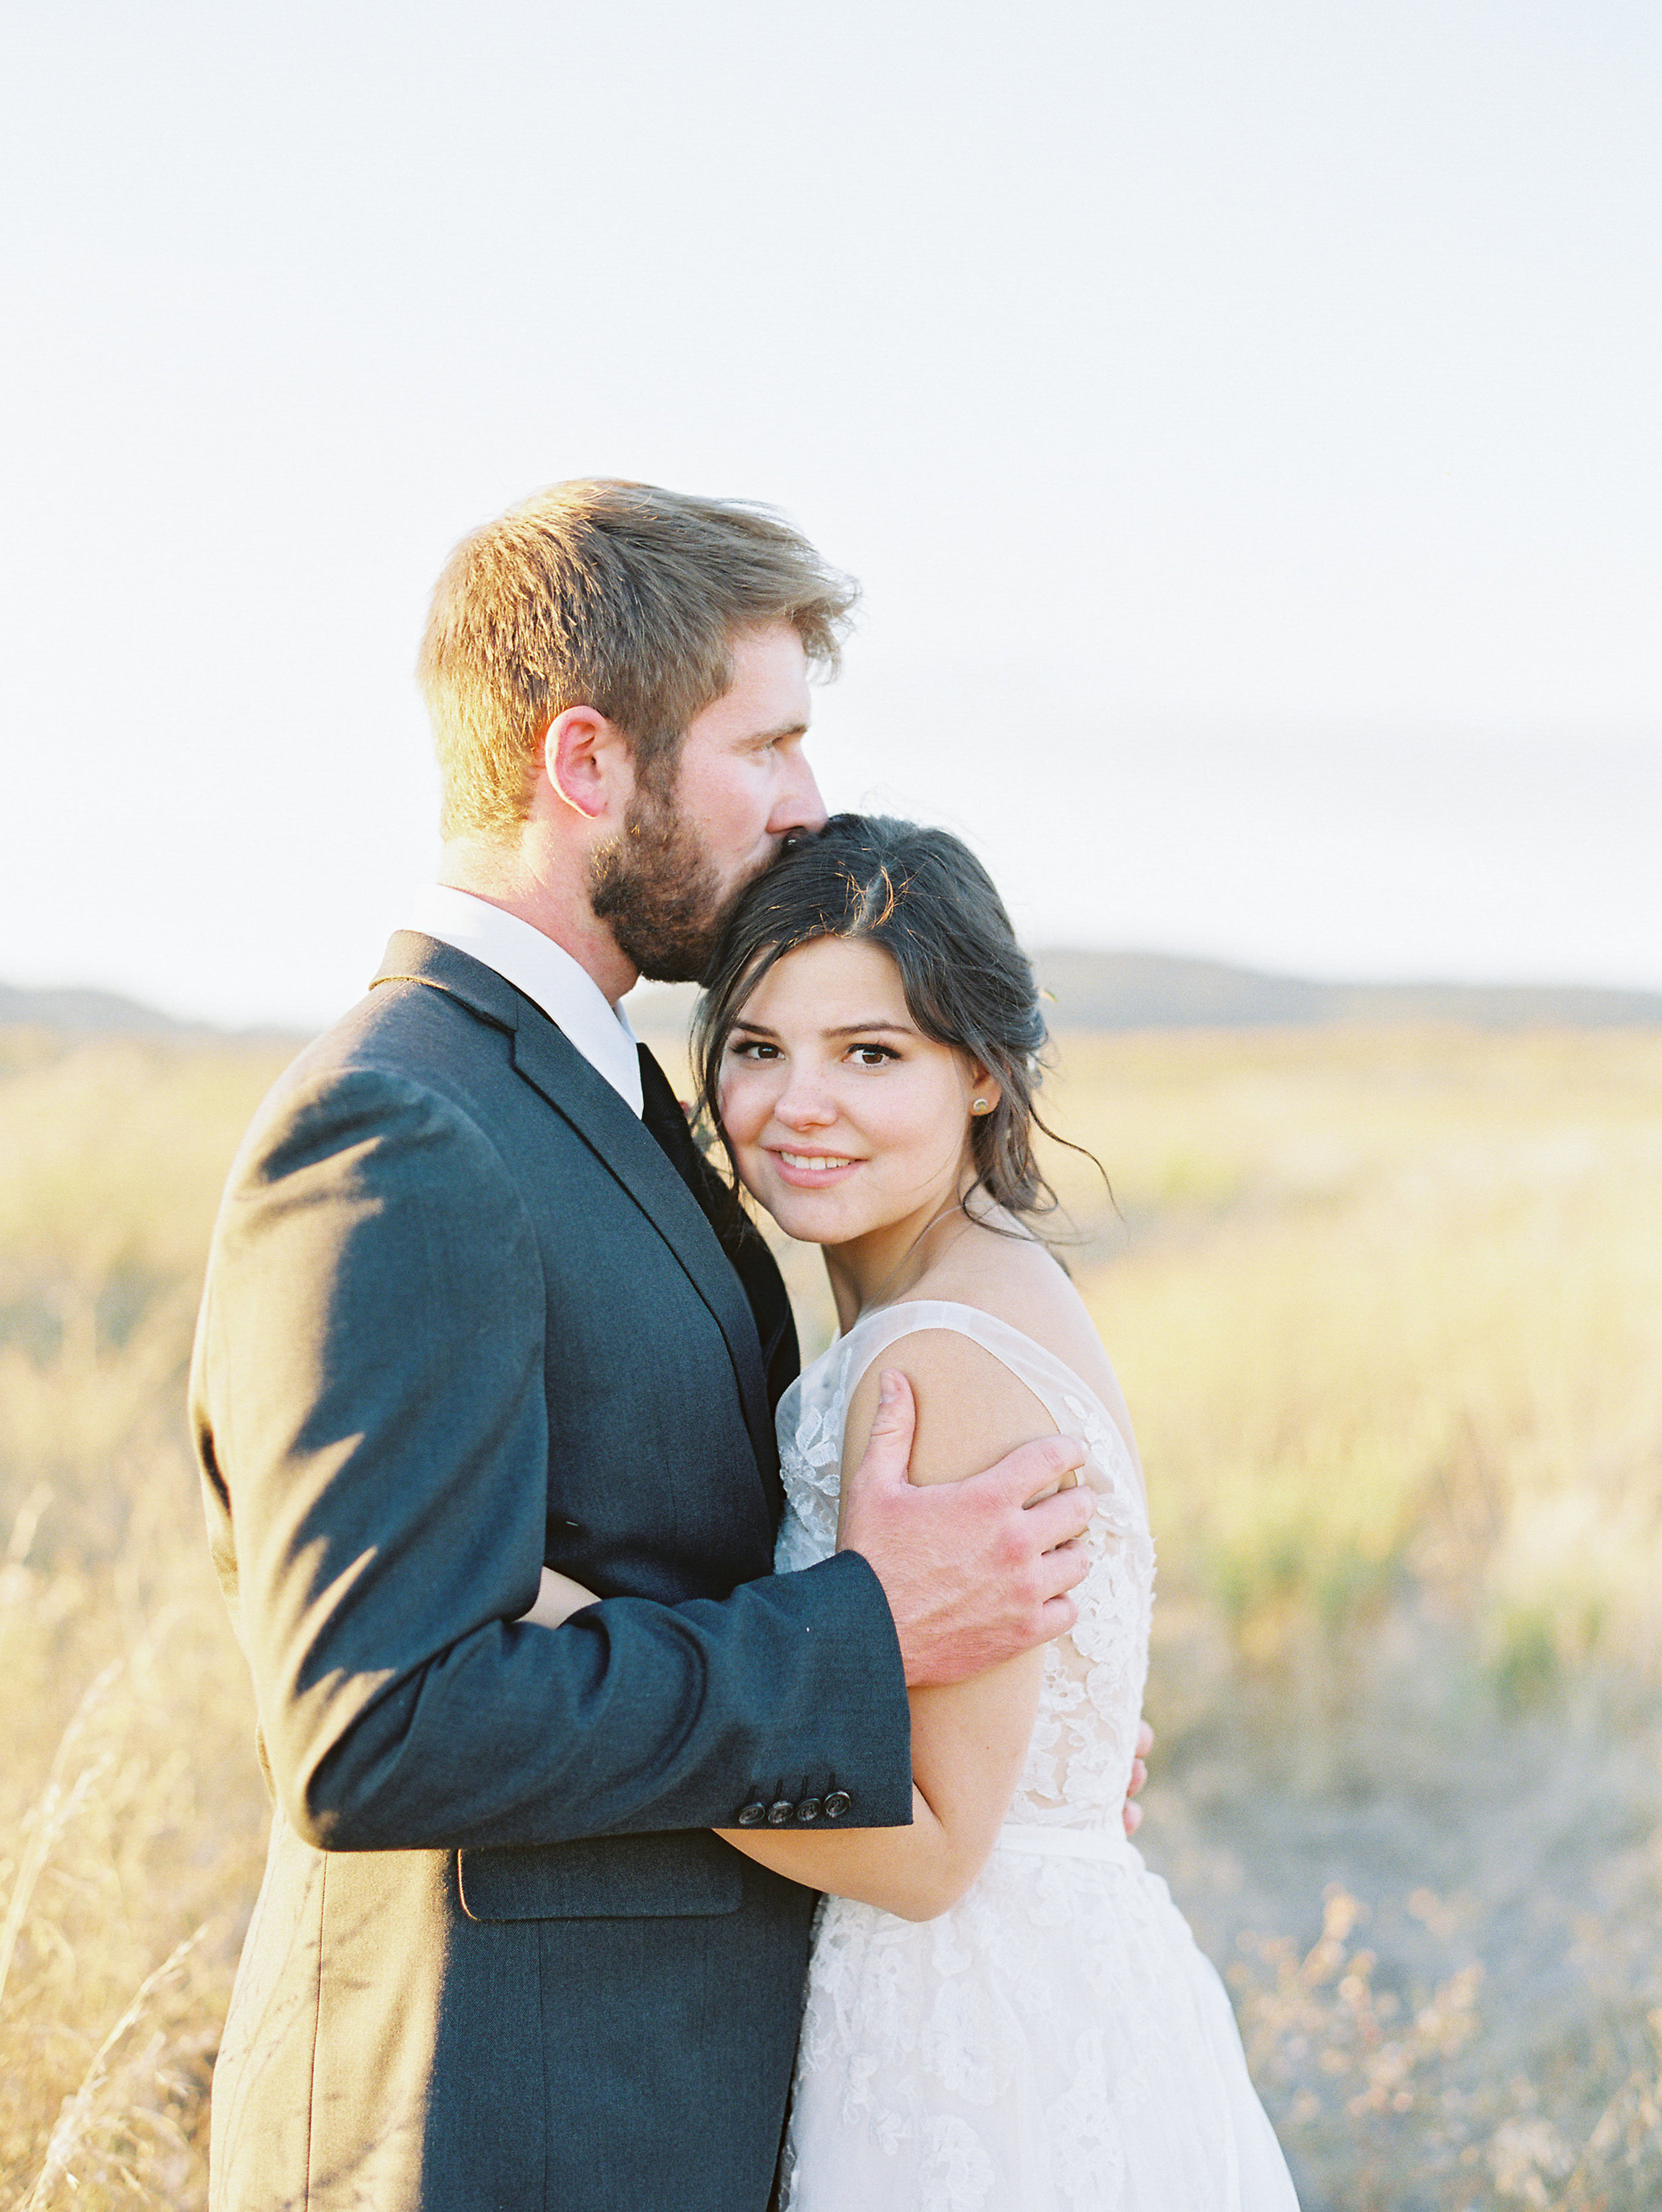 Idaho-Field-Forest-Wedding-Film-Photographer-Kristina-Adams-744(1) (1).jpg